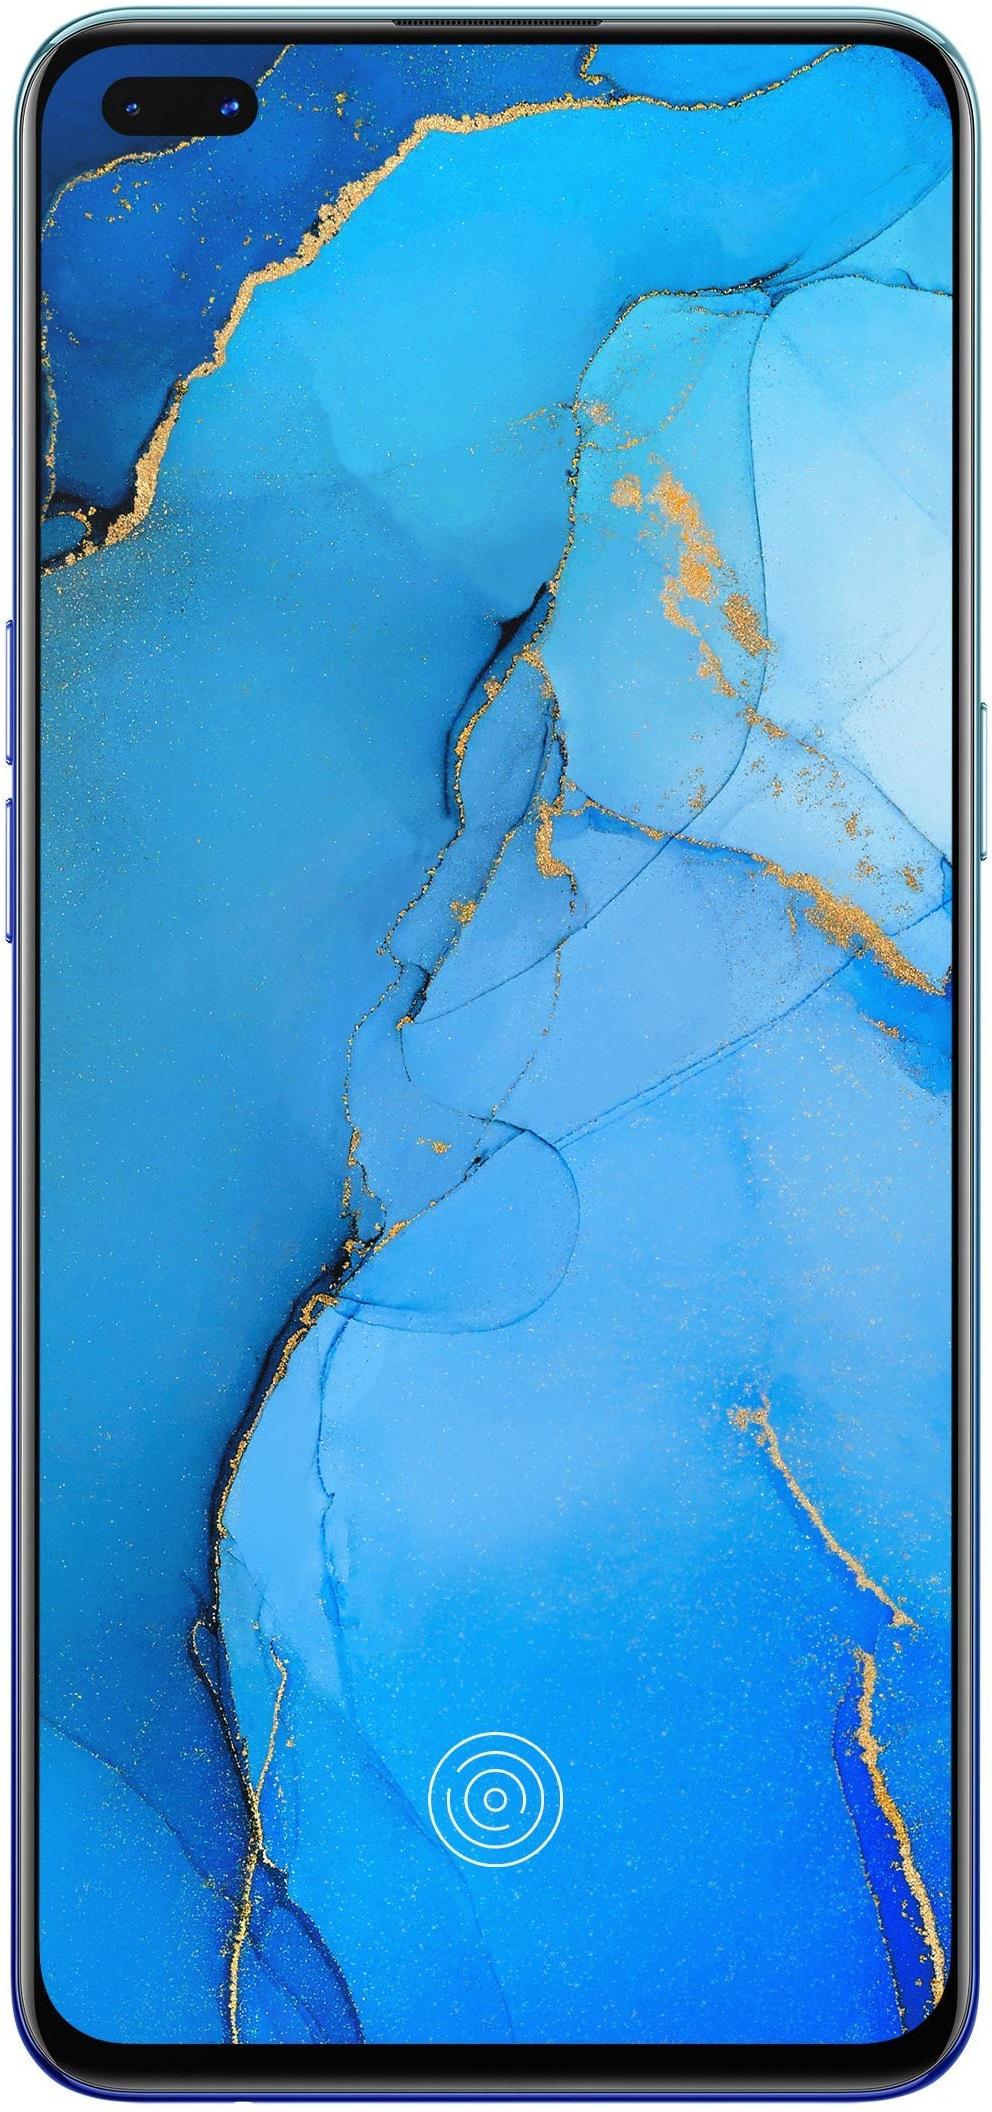 Смартфон Oppo Reno3 Pro: где купить, цены, характеристики